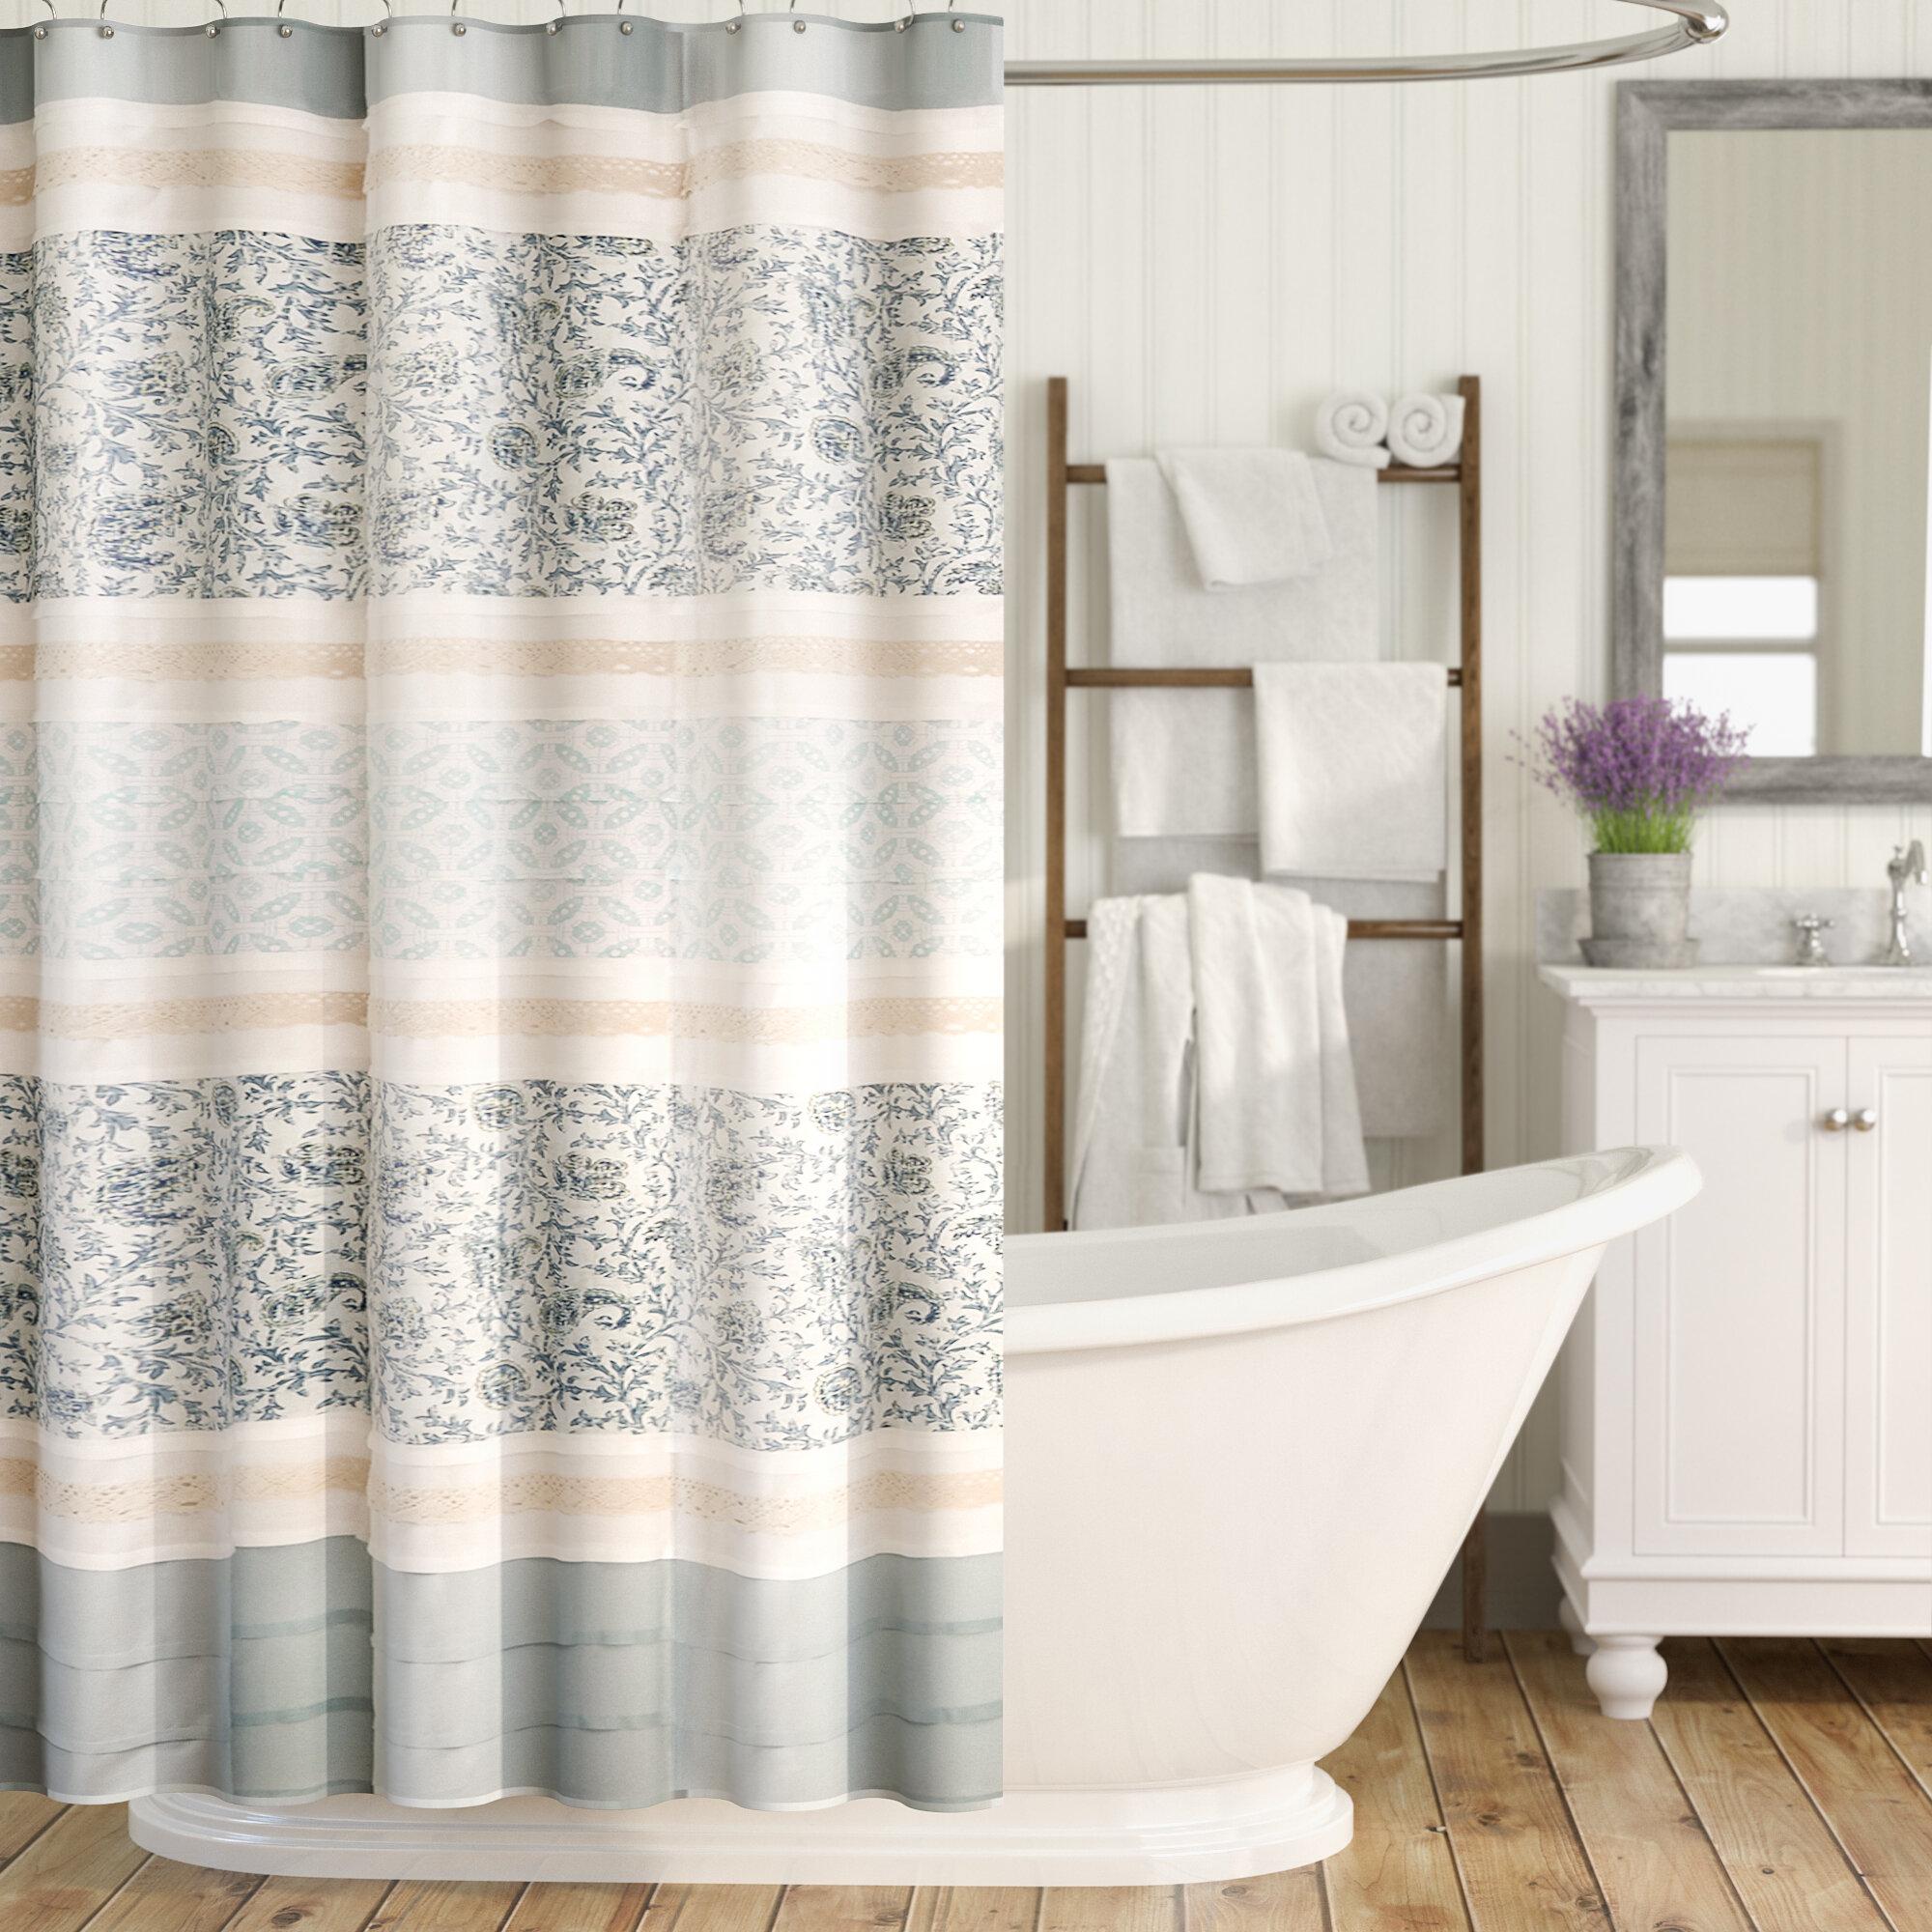 Chambery Cotton Shower Curtain & Reviews | Birch Lane